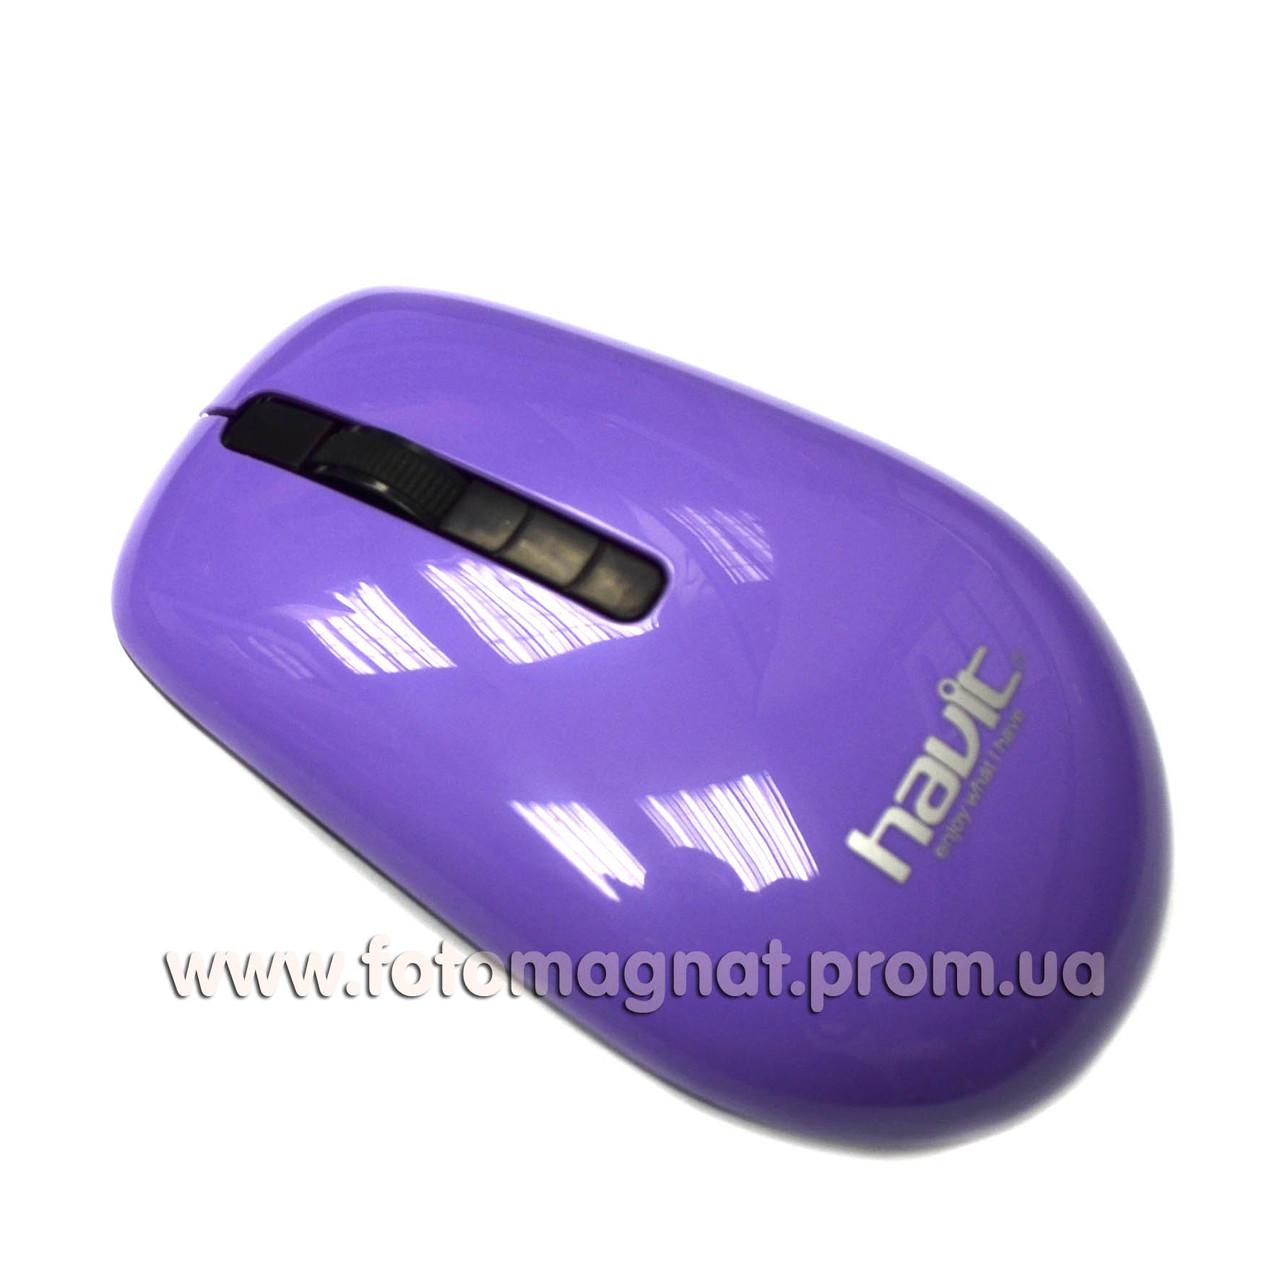 Мышка для компьютера беспроводная mouse HAVIT  HV-MS261 GT Wireless USB